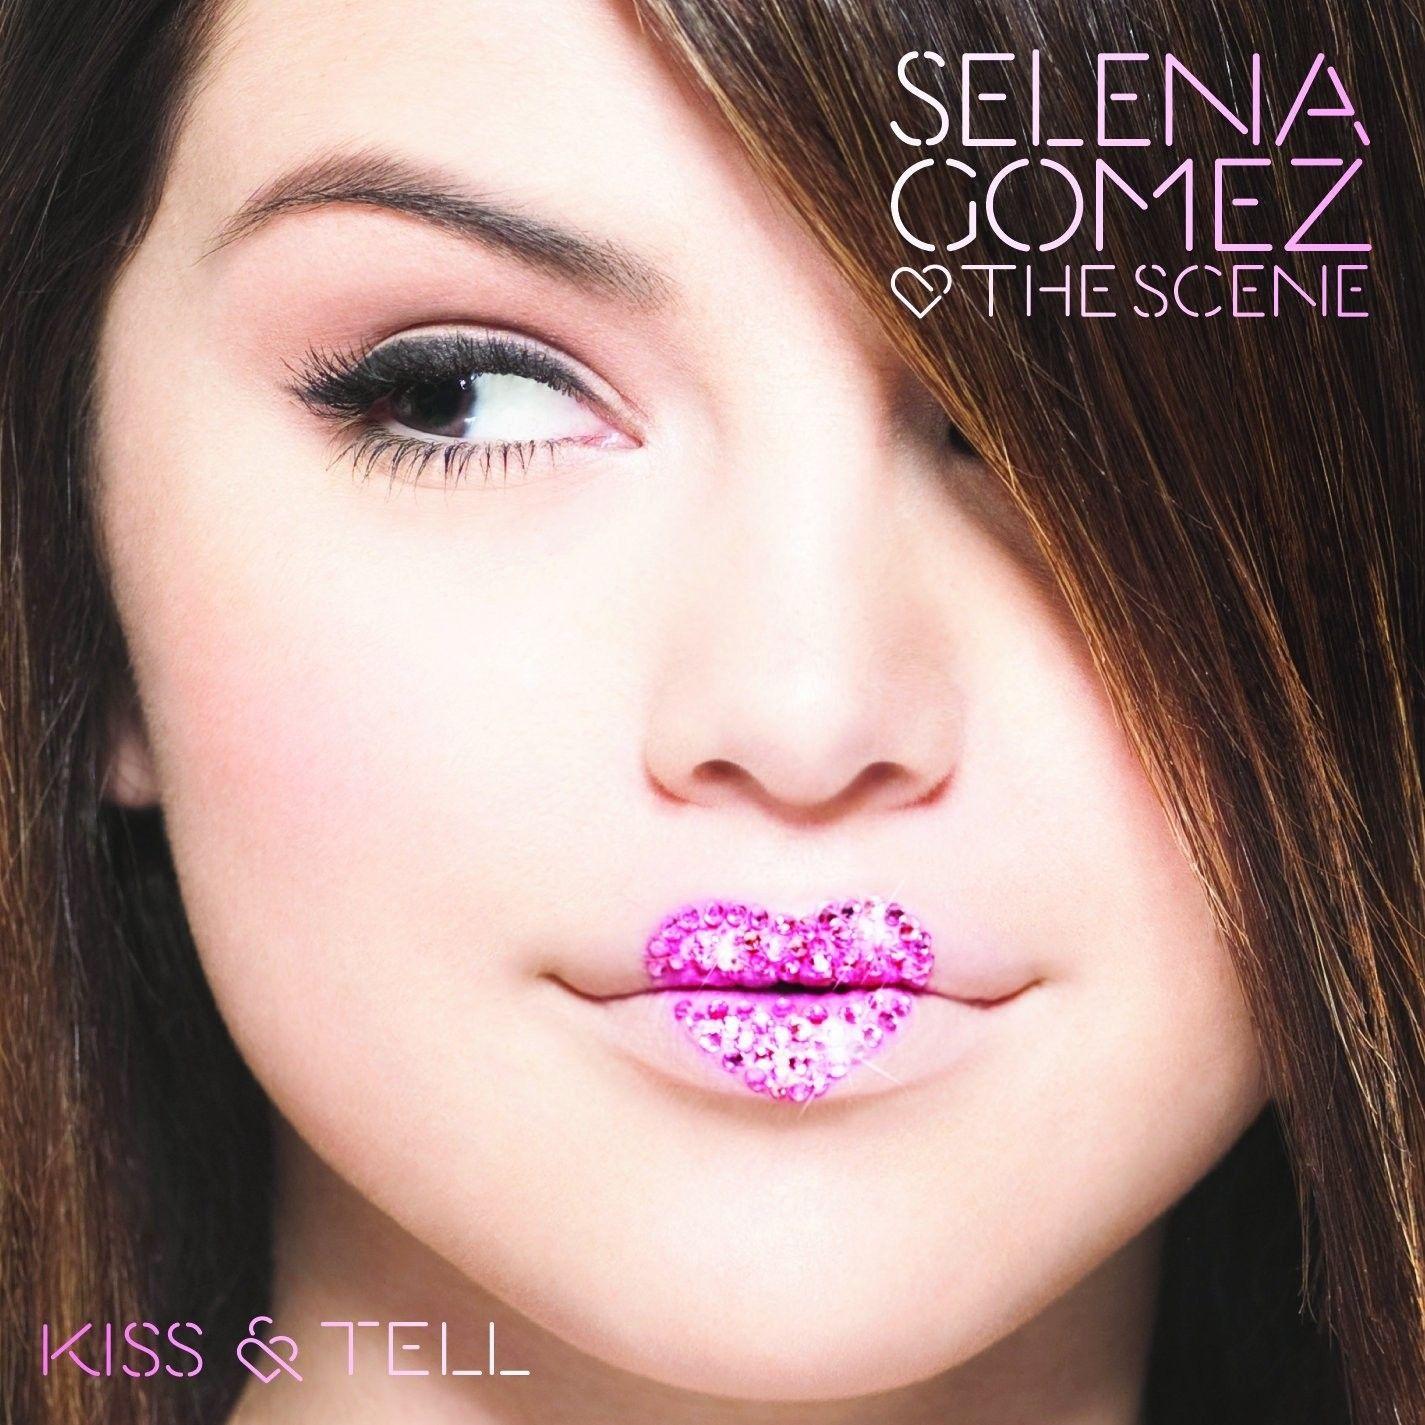 Selena Gomez & The Scene - Kiss And Tell album cover